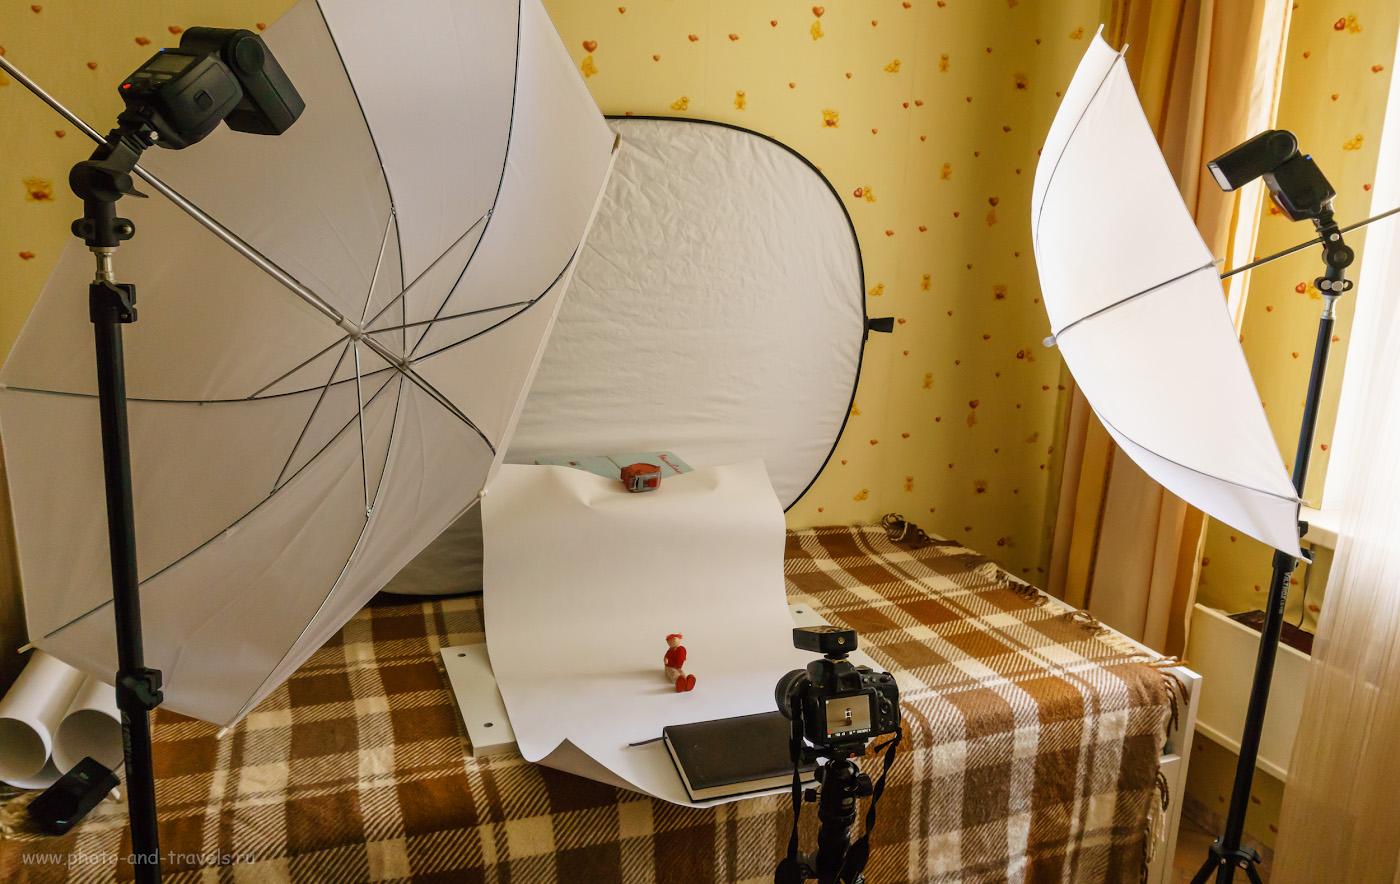 Фото 18. Моя студия в квартире с камерой Nikon D5100 KIT 18-55mm f/3.5-5.6 и 2 вспышками Yongnuo YN-685N, белым отражателем. Белый фон - лист ватмана. Управление импульсным светом - от контроллера Yongnuo YN-622N-TX. Снято на Сони А6000 КИТ 16-50/3,5-5,6 со следующими настройками: 1/50, -0.3, 8.0, 800, 16.